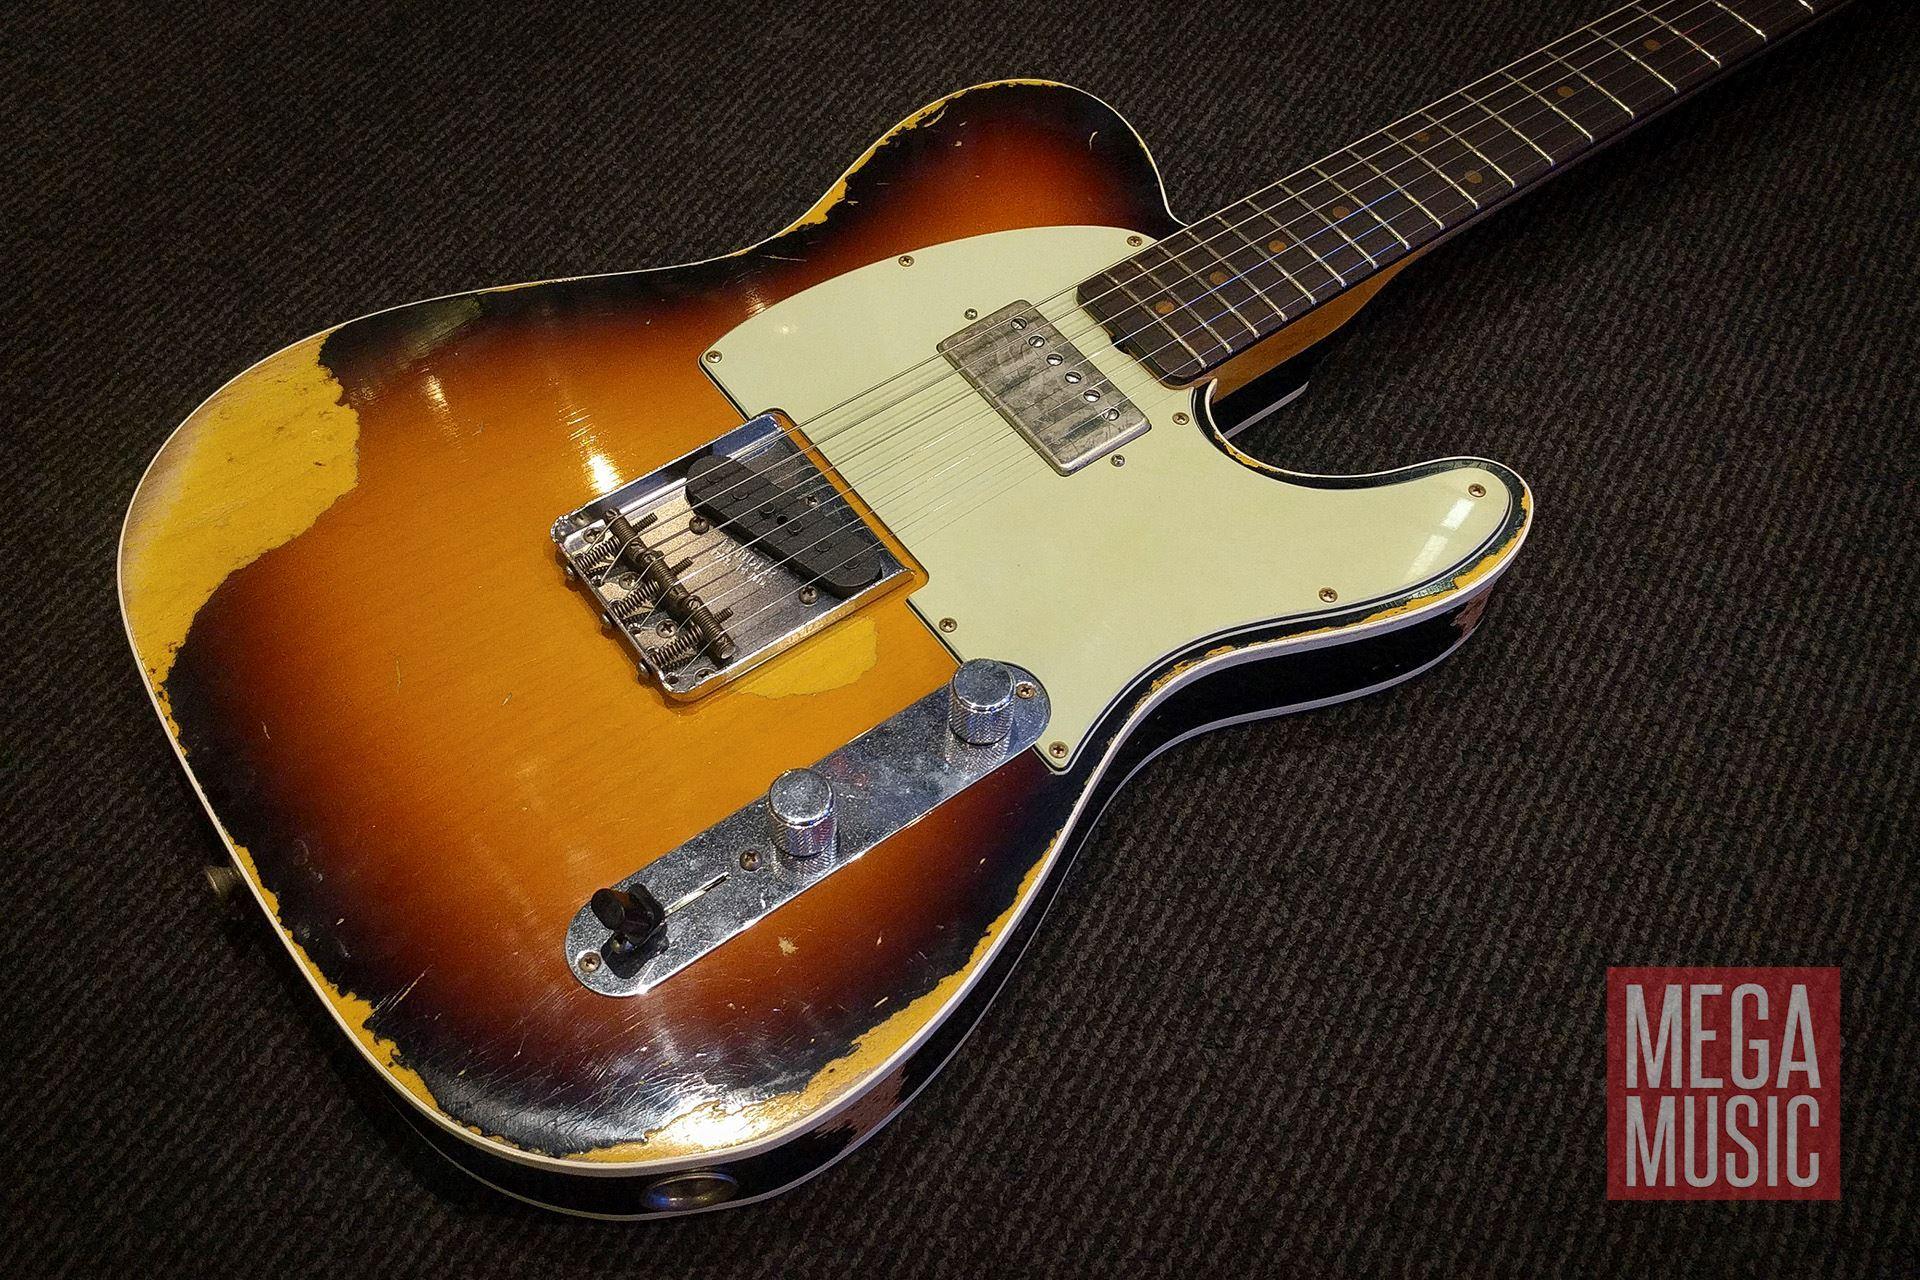 fender custom shop 39 60s heavy relic telecaster electric guitar super faded aged 3 tone sunburst. Black Bedroom Furniture Sets. Home Design Ideas